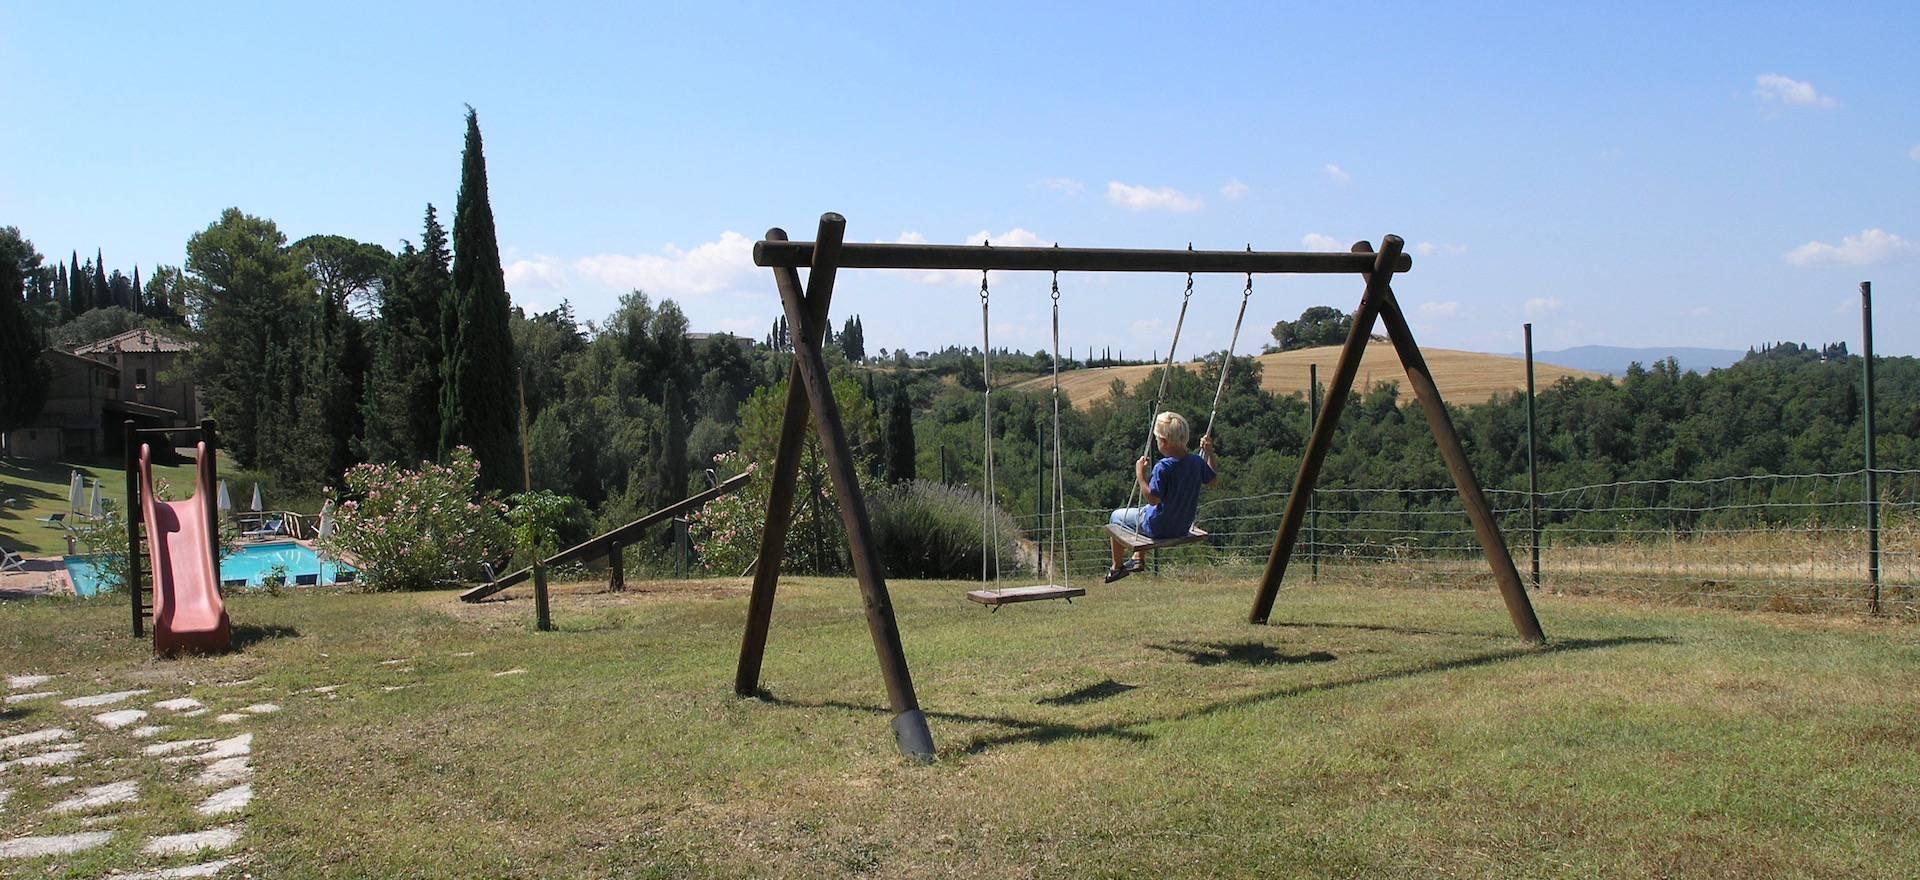 Agriturismo Toscane Agriturismo in Toscane met prachtig uitzicht